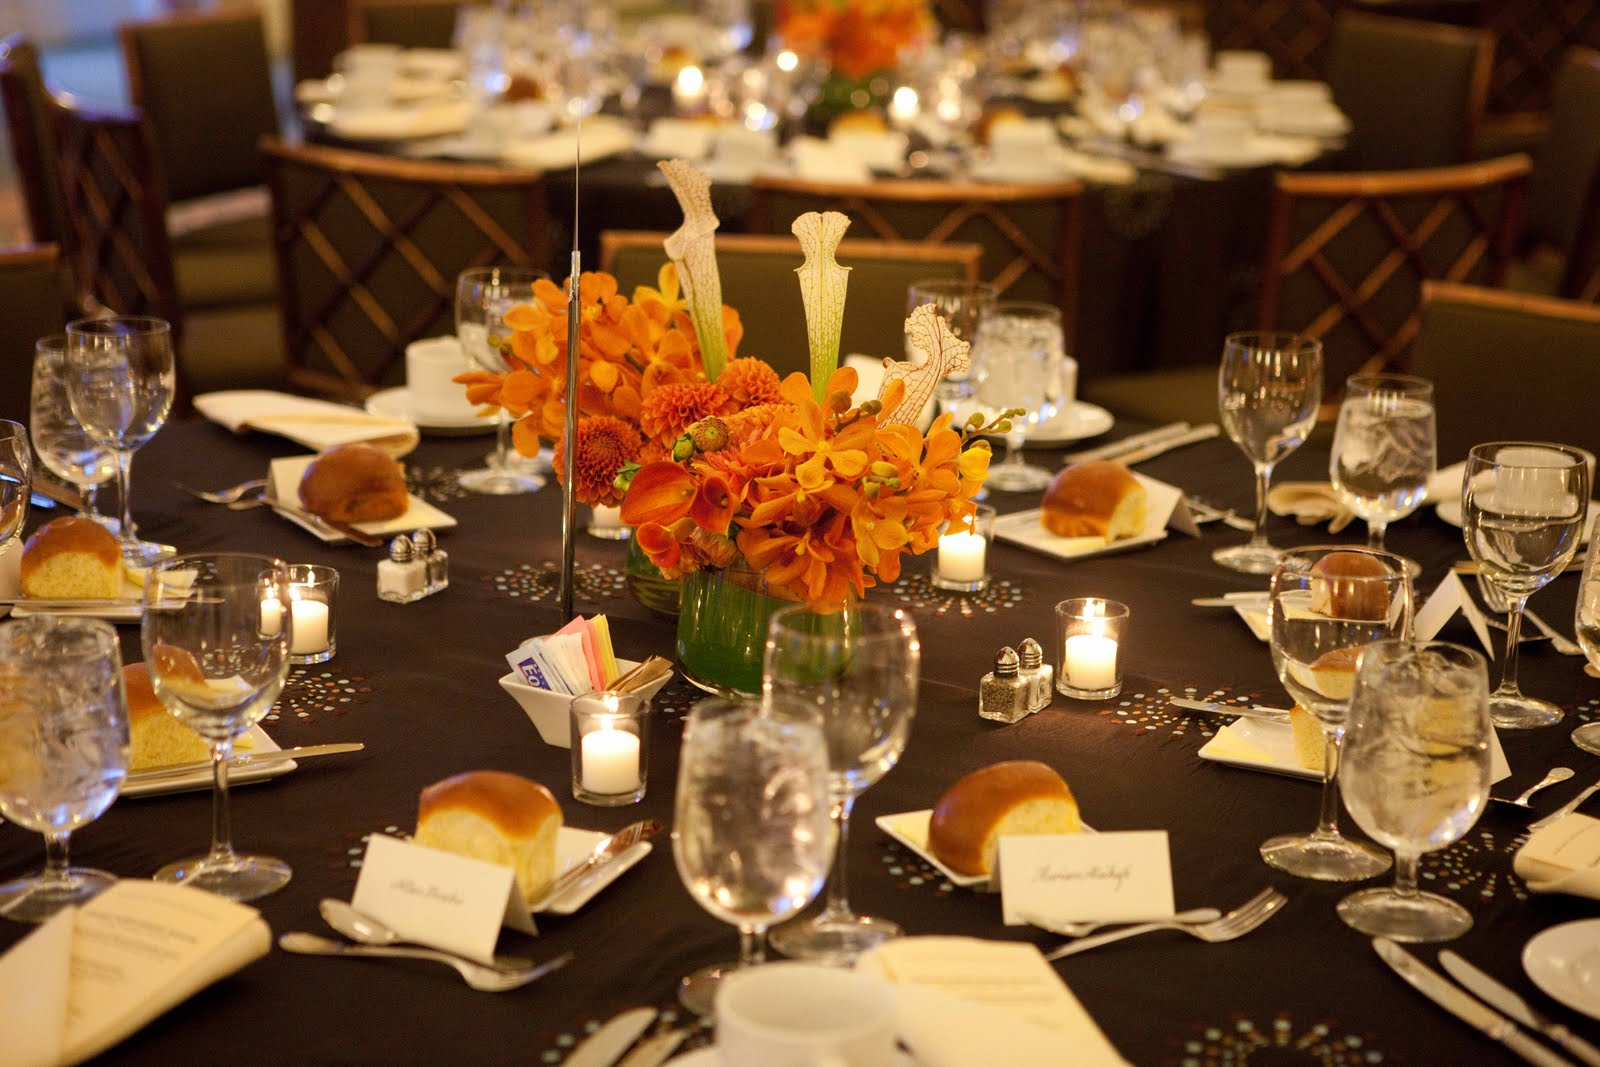 Best Table Setting Ever & Best Table Setting Ever | Susan Young Photo